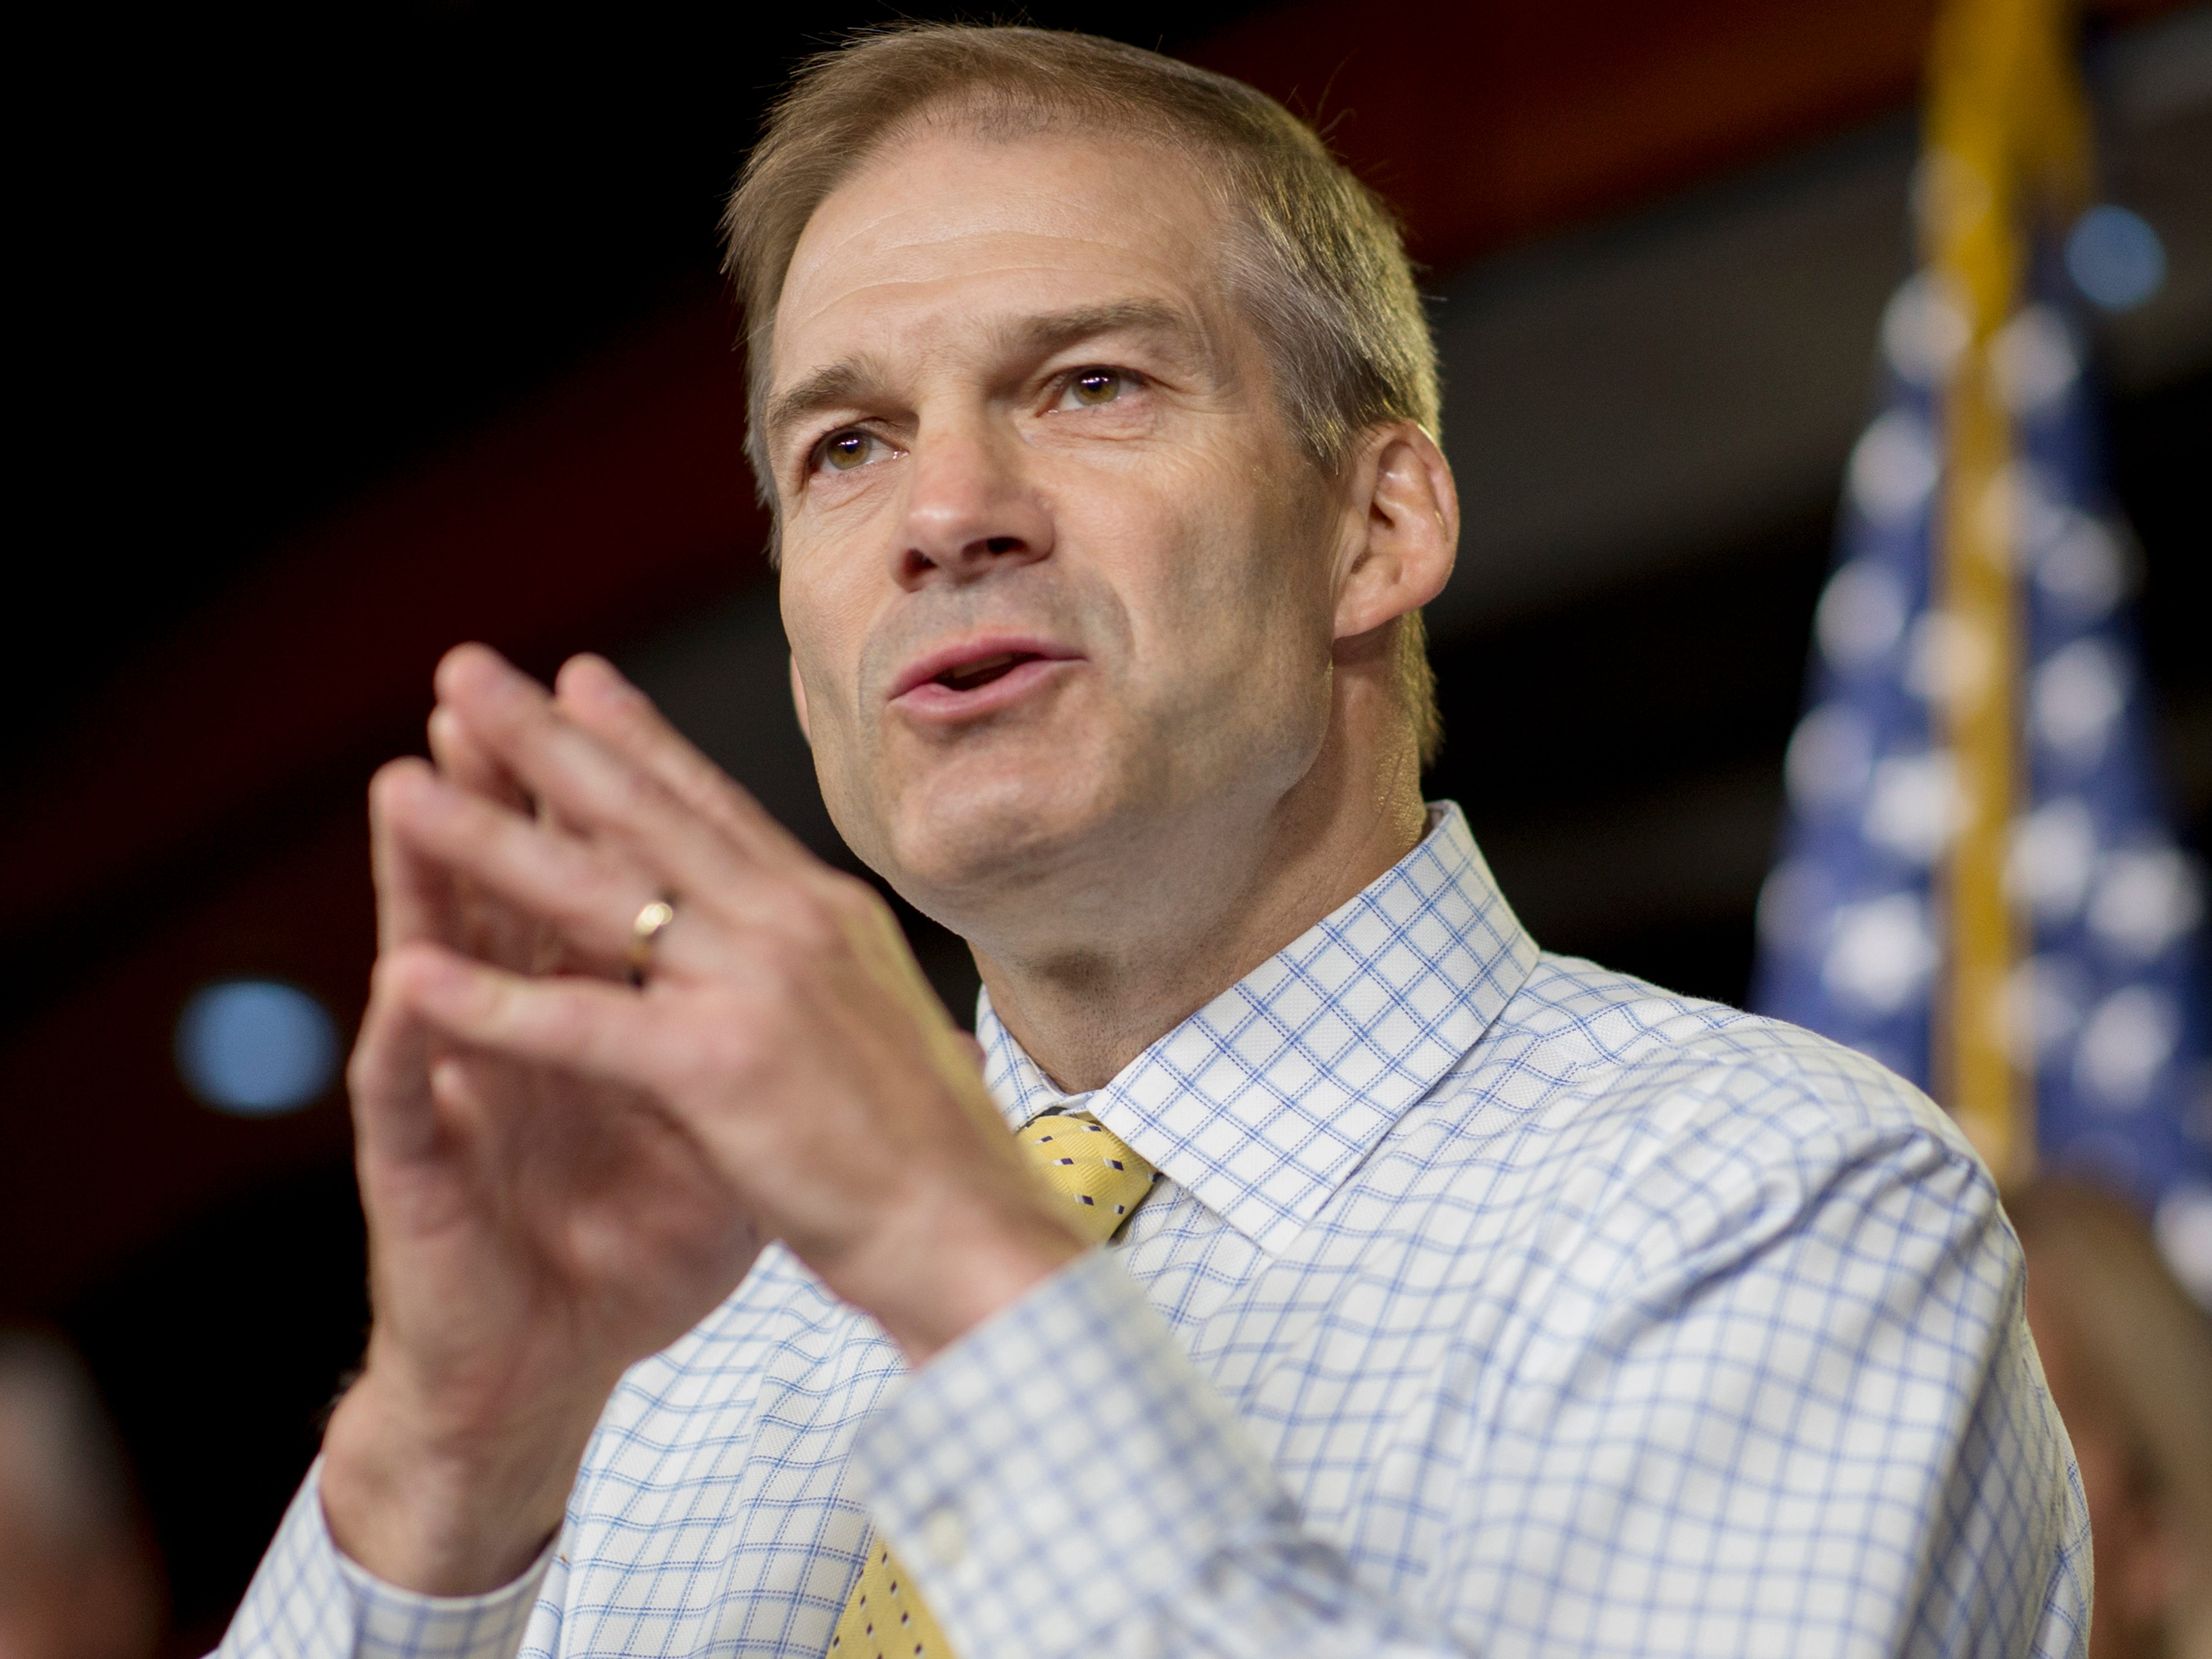 Trump tried to broker House leadership deal, promote loyalist Jim Jordan, report says